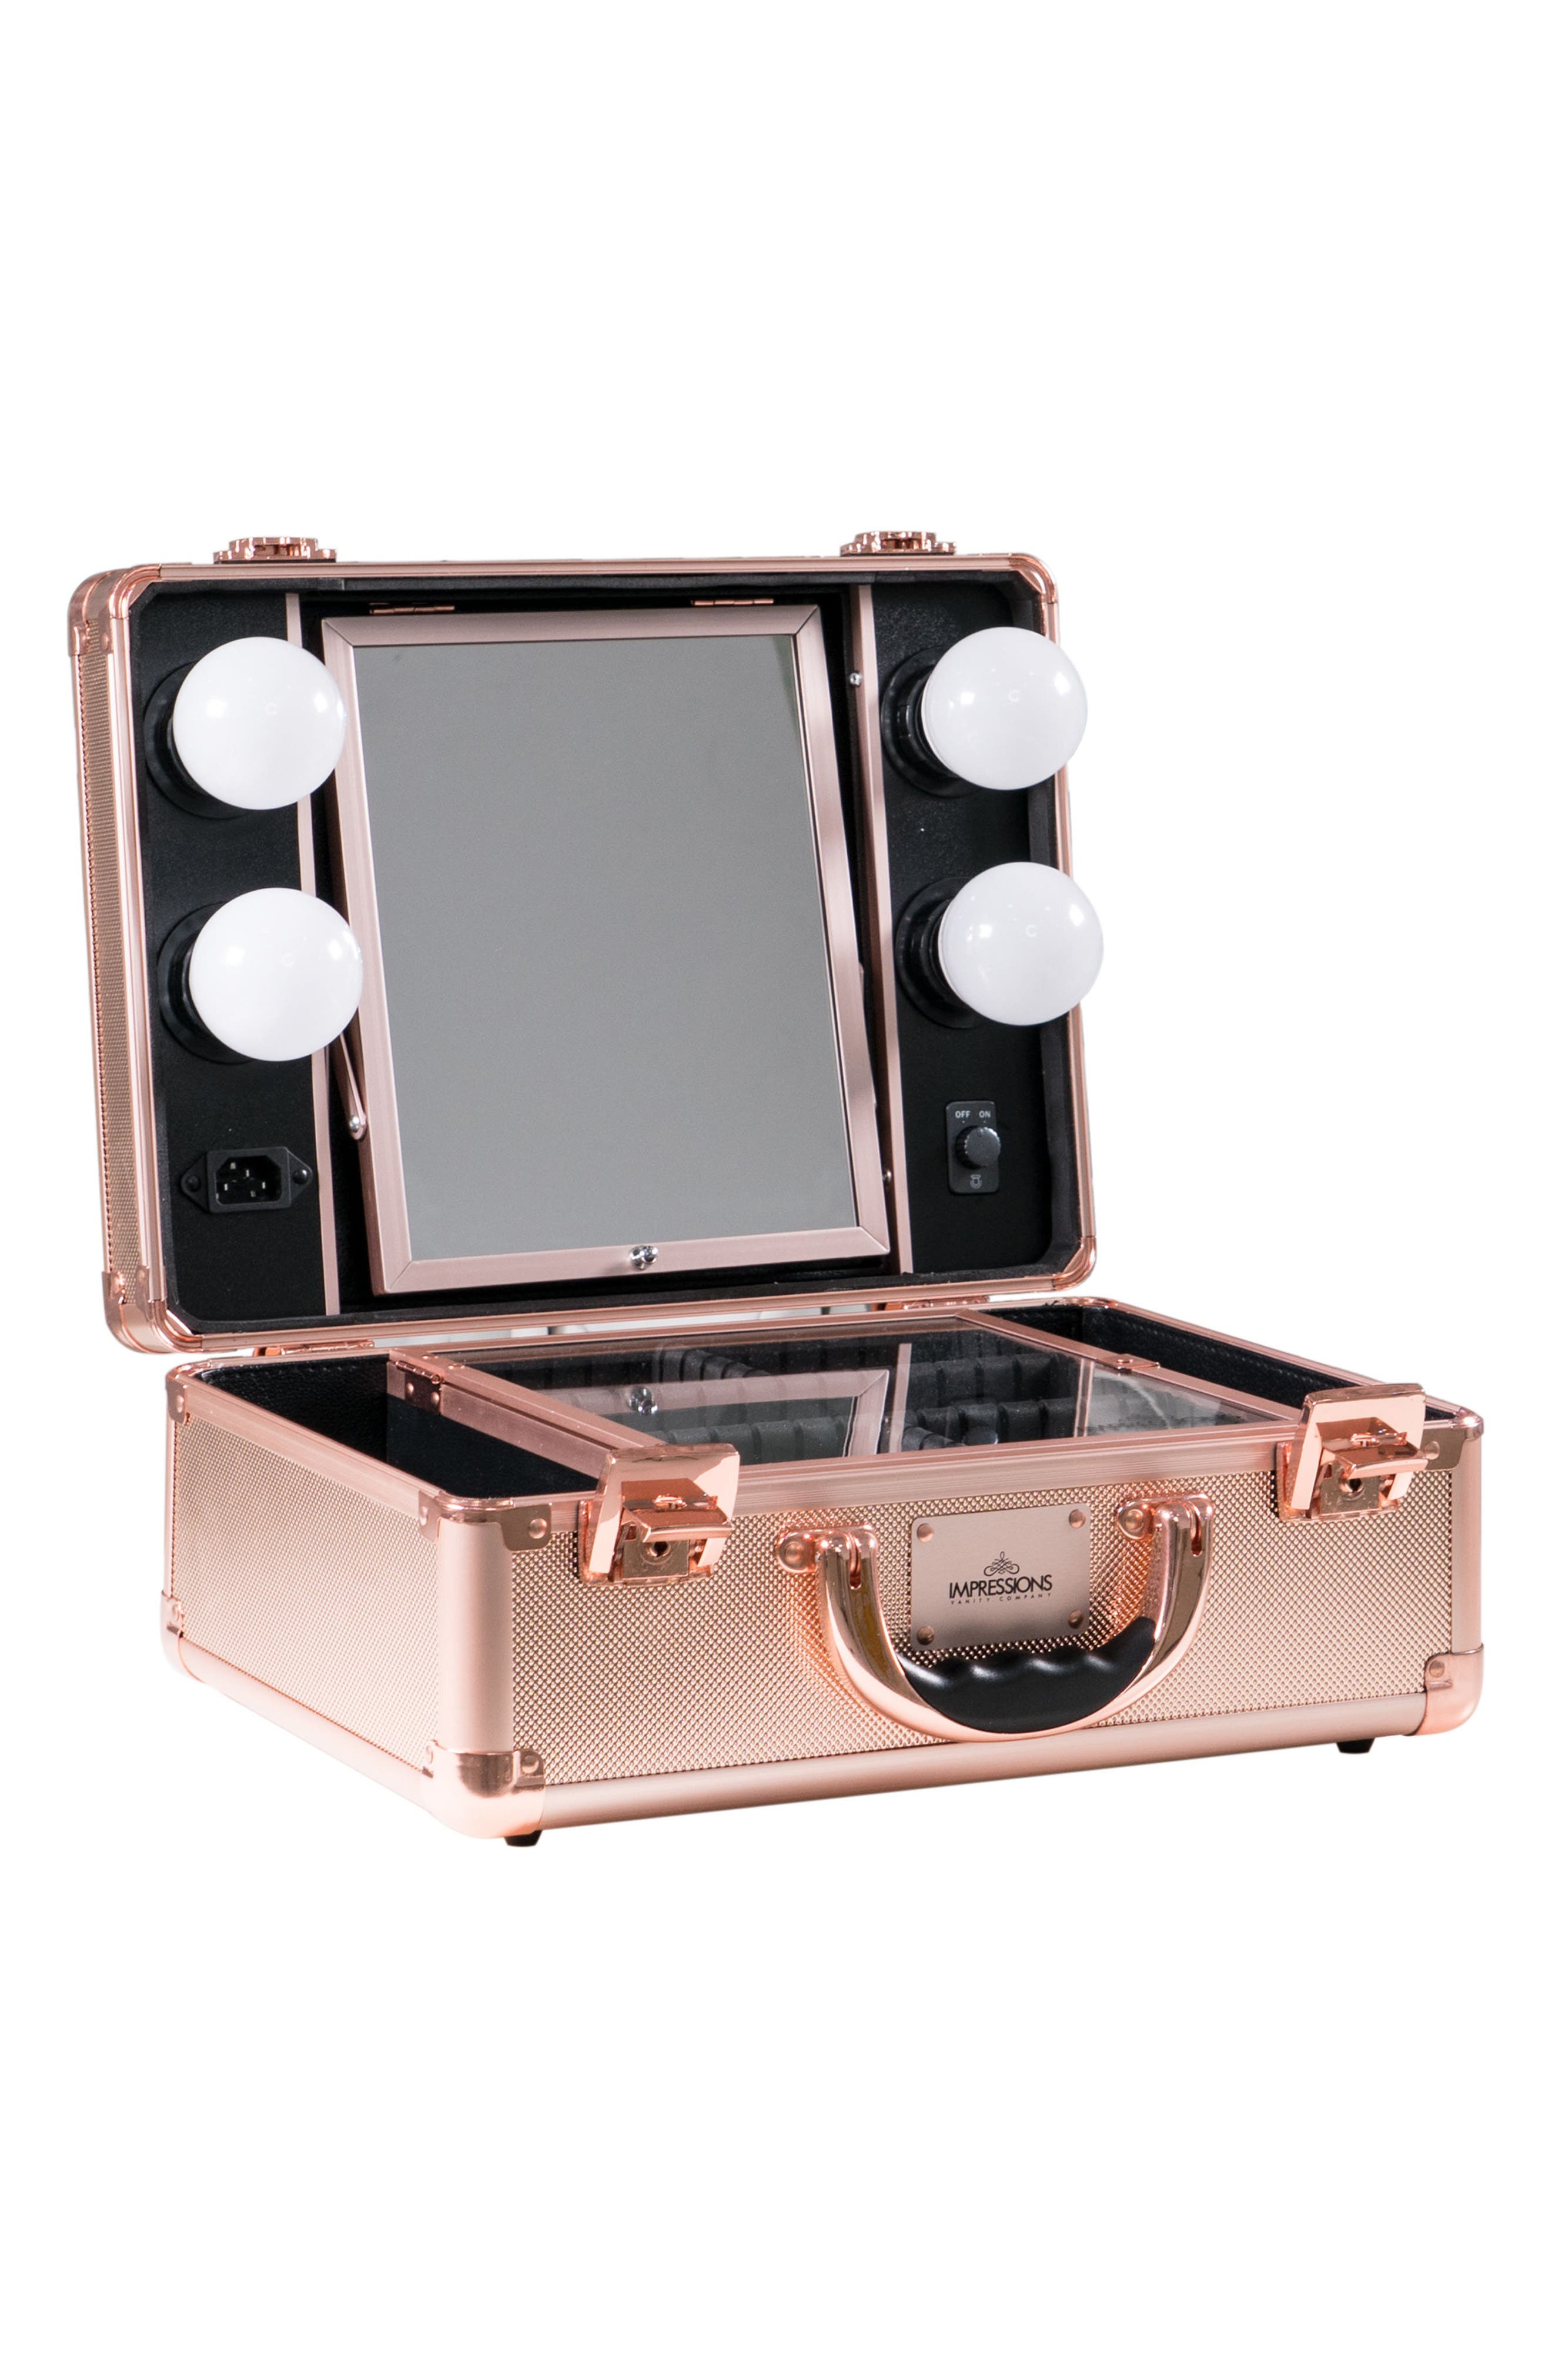 Alternate Image 1 Selected - Impressions Vanity Co. SlayCase™ Vanity Travel Case